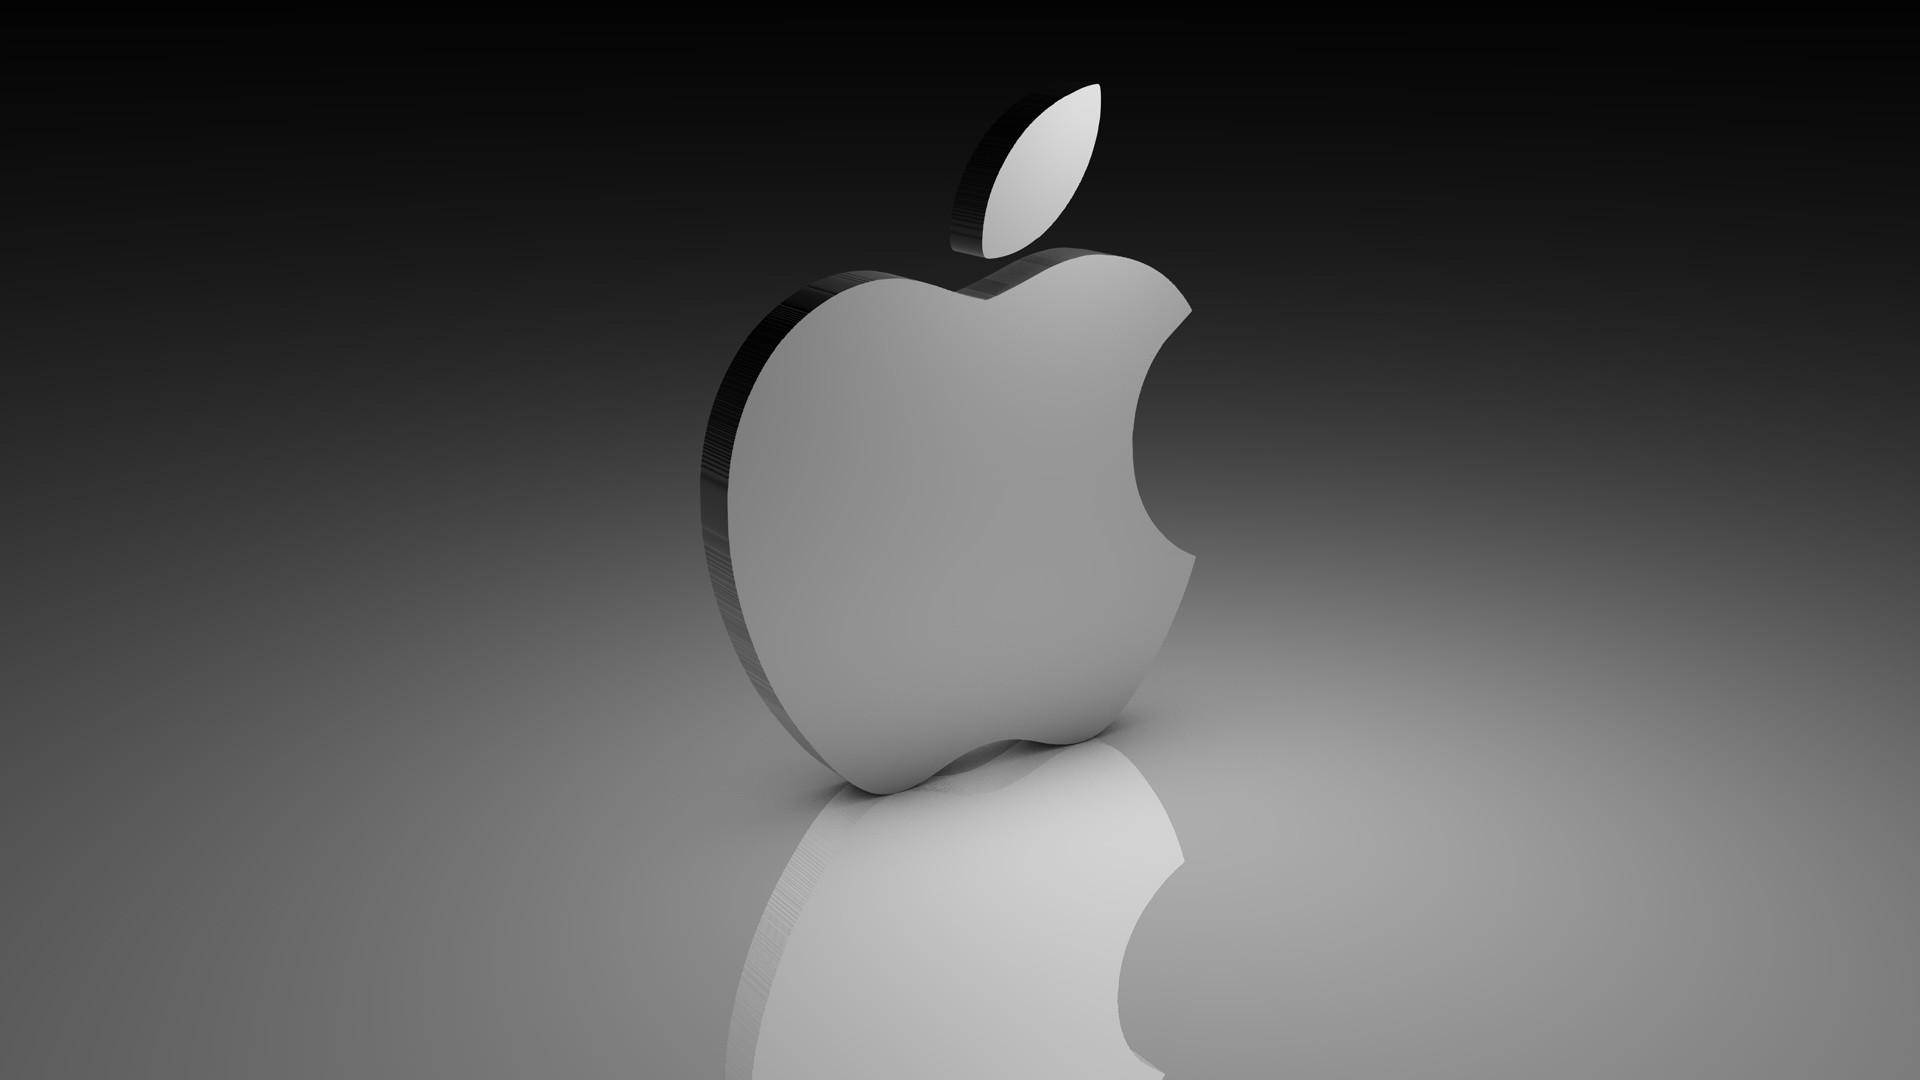 apple logo hd wallpaper MAC OS Wallpapers HD, mac os wallpaper wide screen,  mac